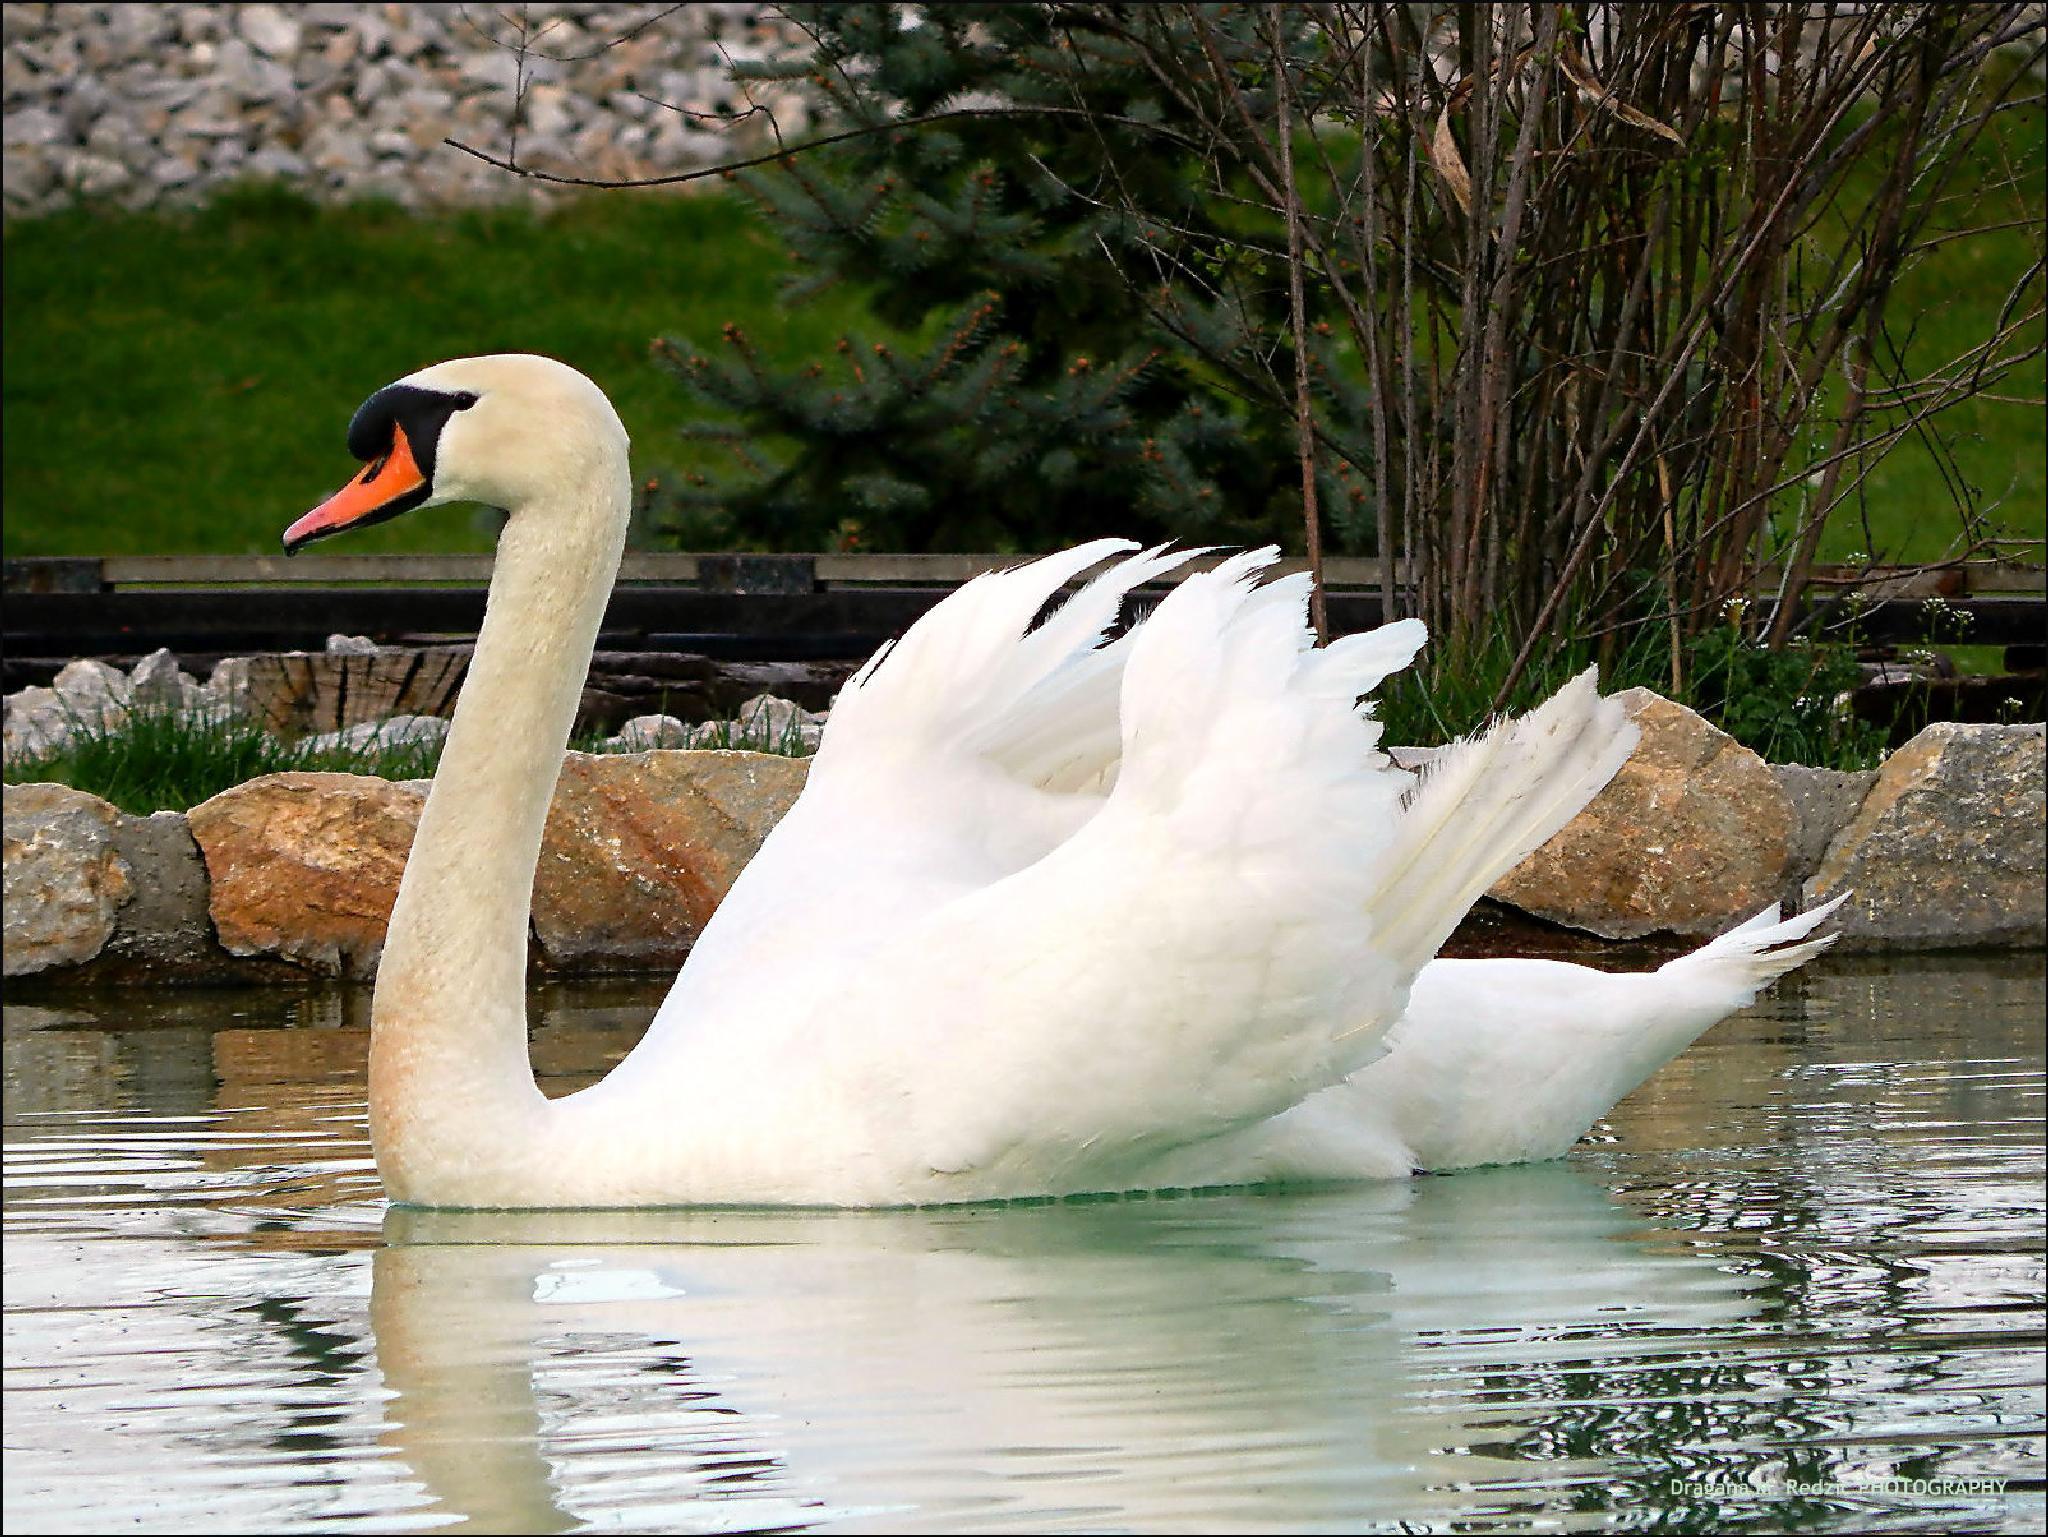 White swan by Драгана М. Реџић